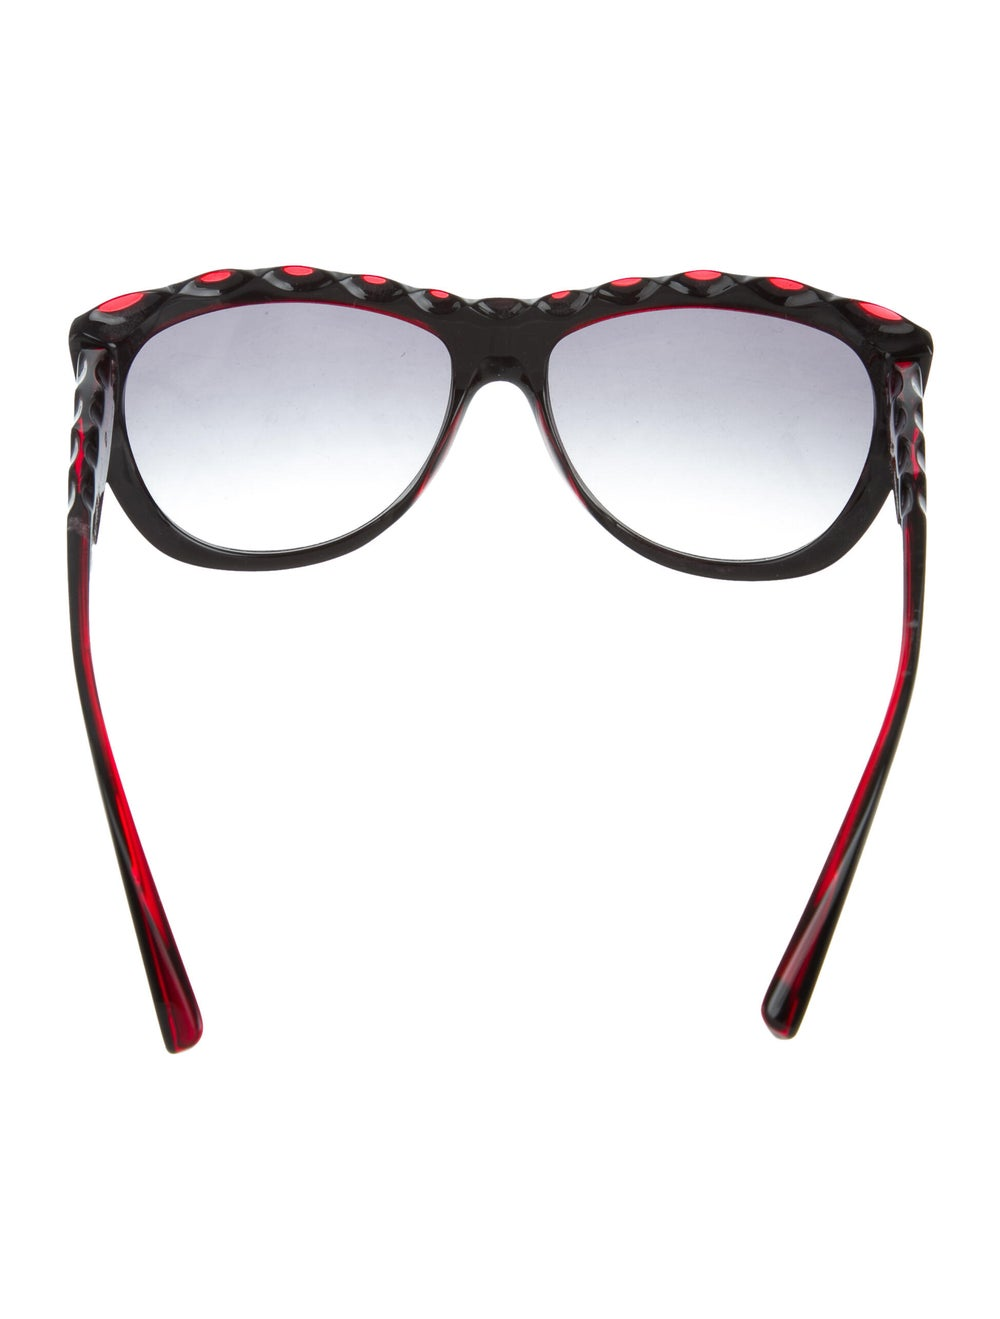 Alain Mikli Gradient Scalloped Sunglasses Red - image 3